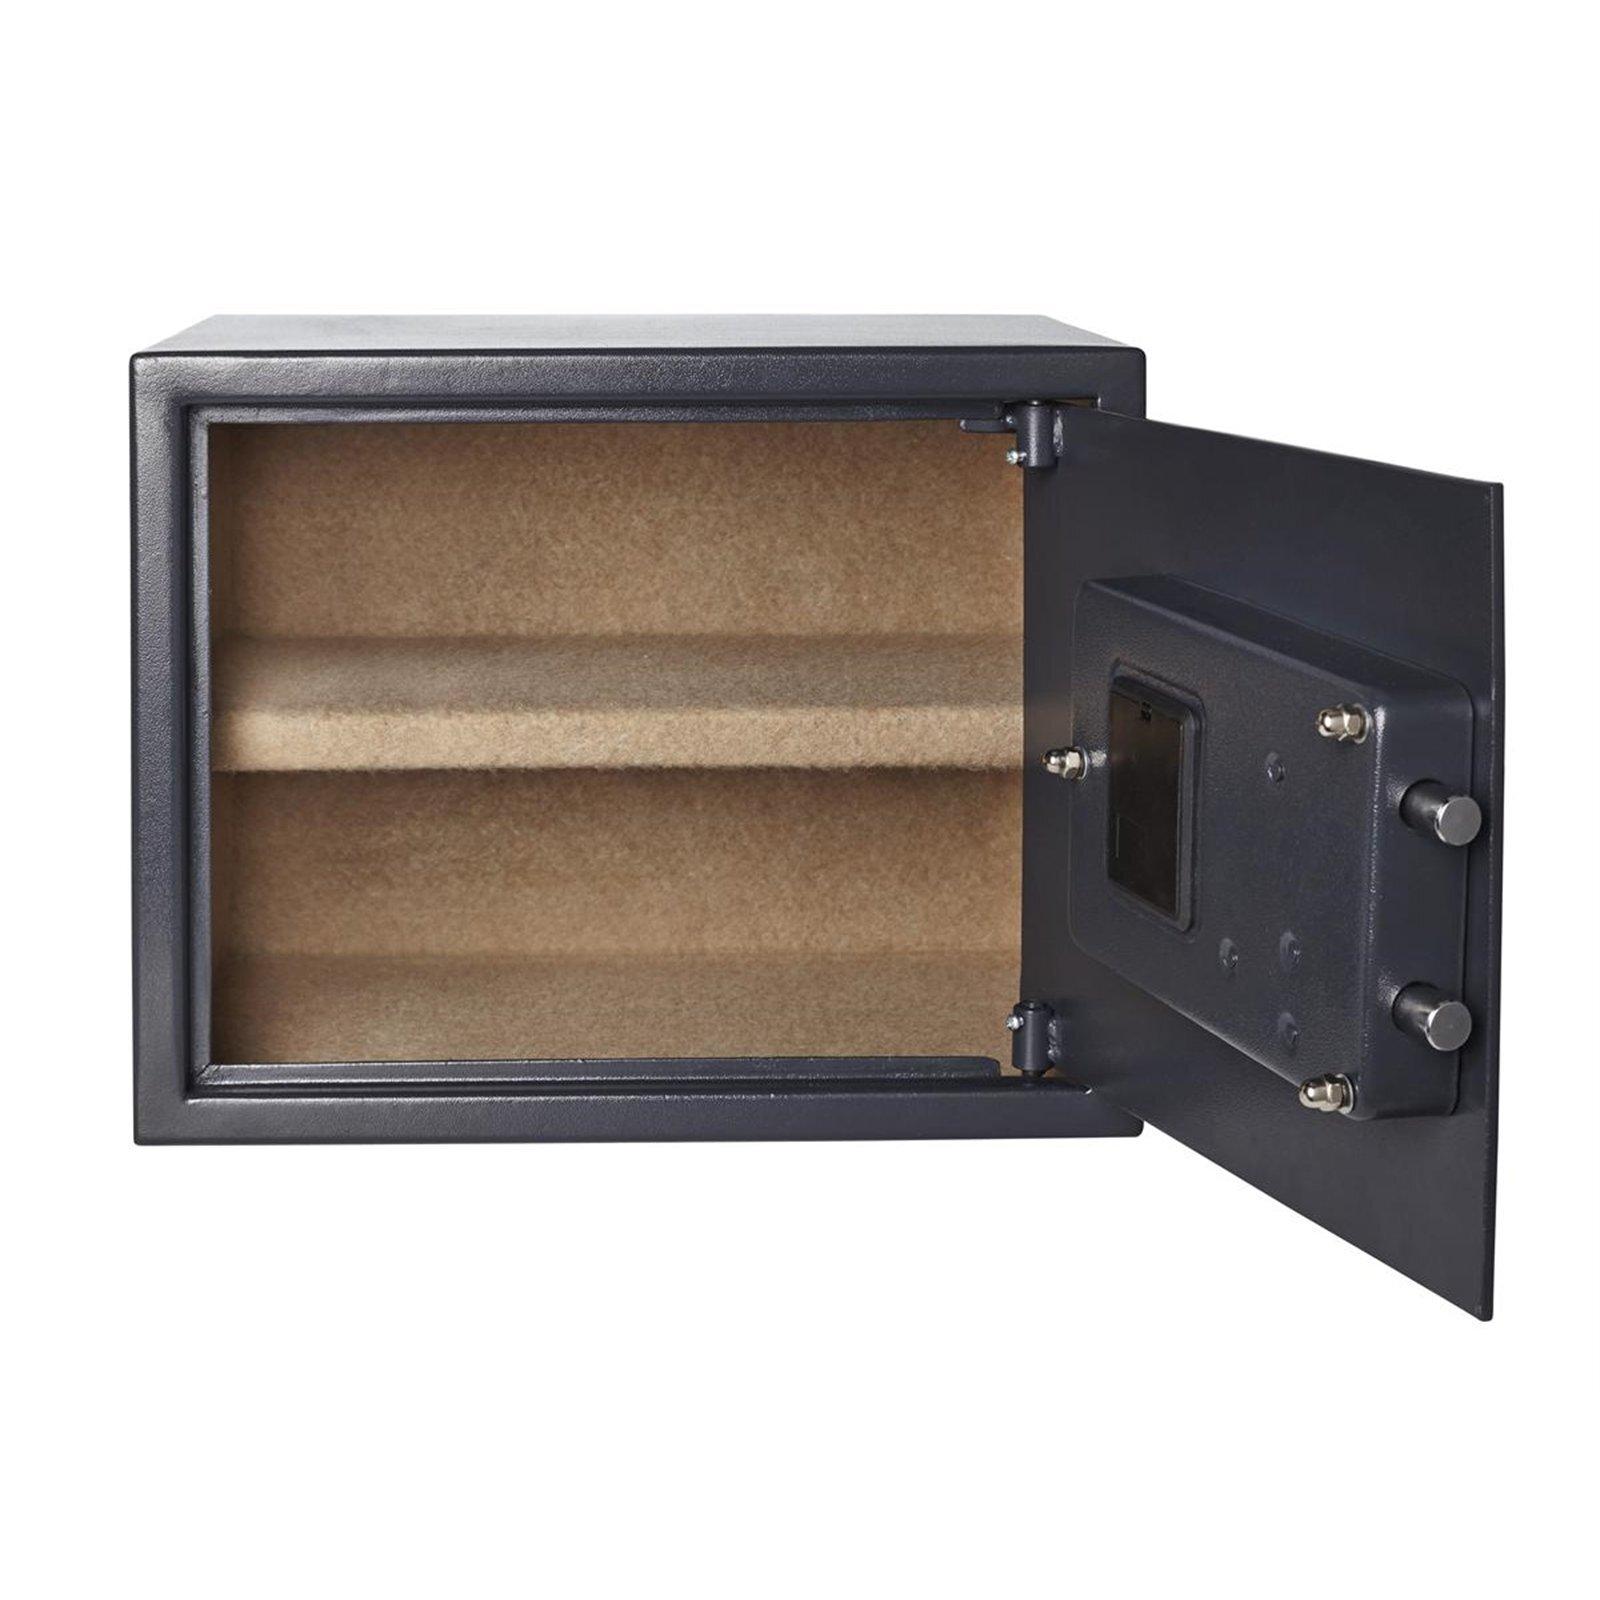 Lockwood Medium Digital Home Safe